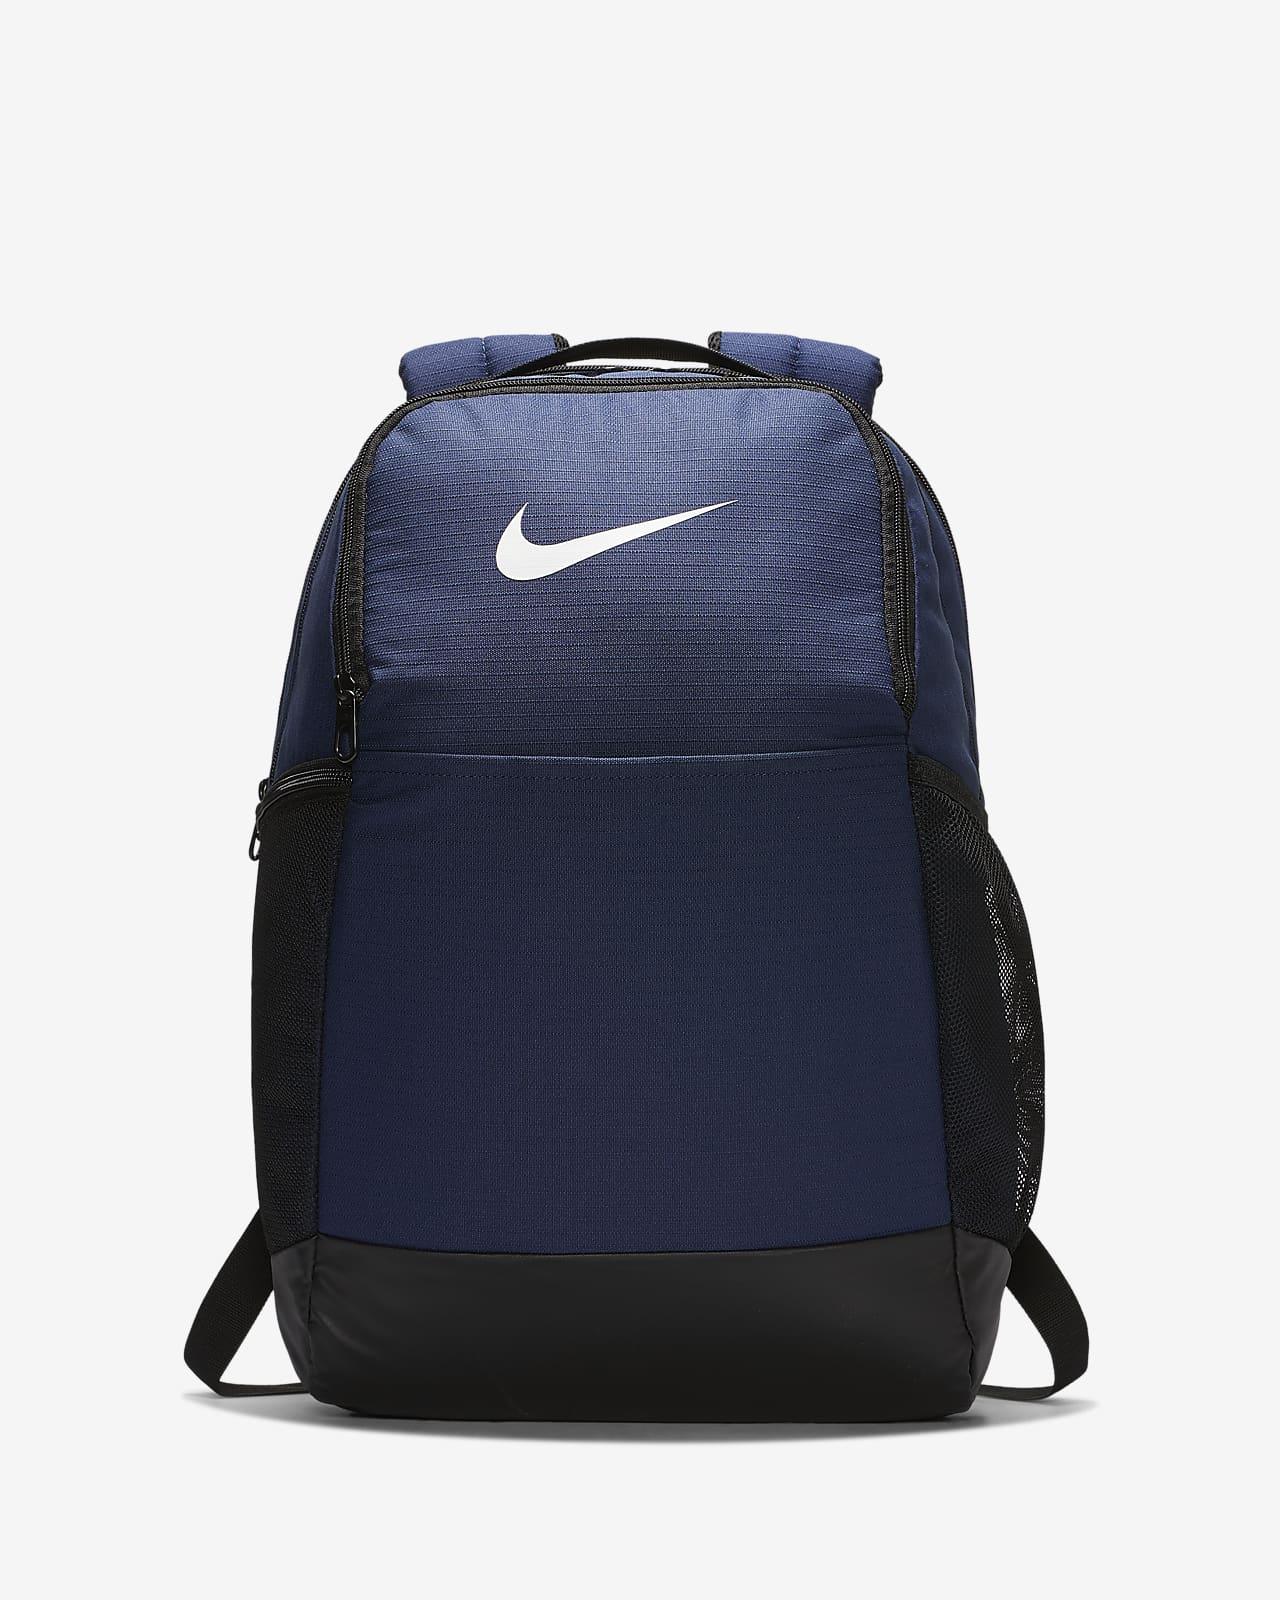 Nike Brasilia Trainings-Rucksack (Medium)